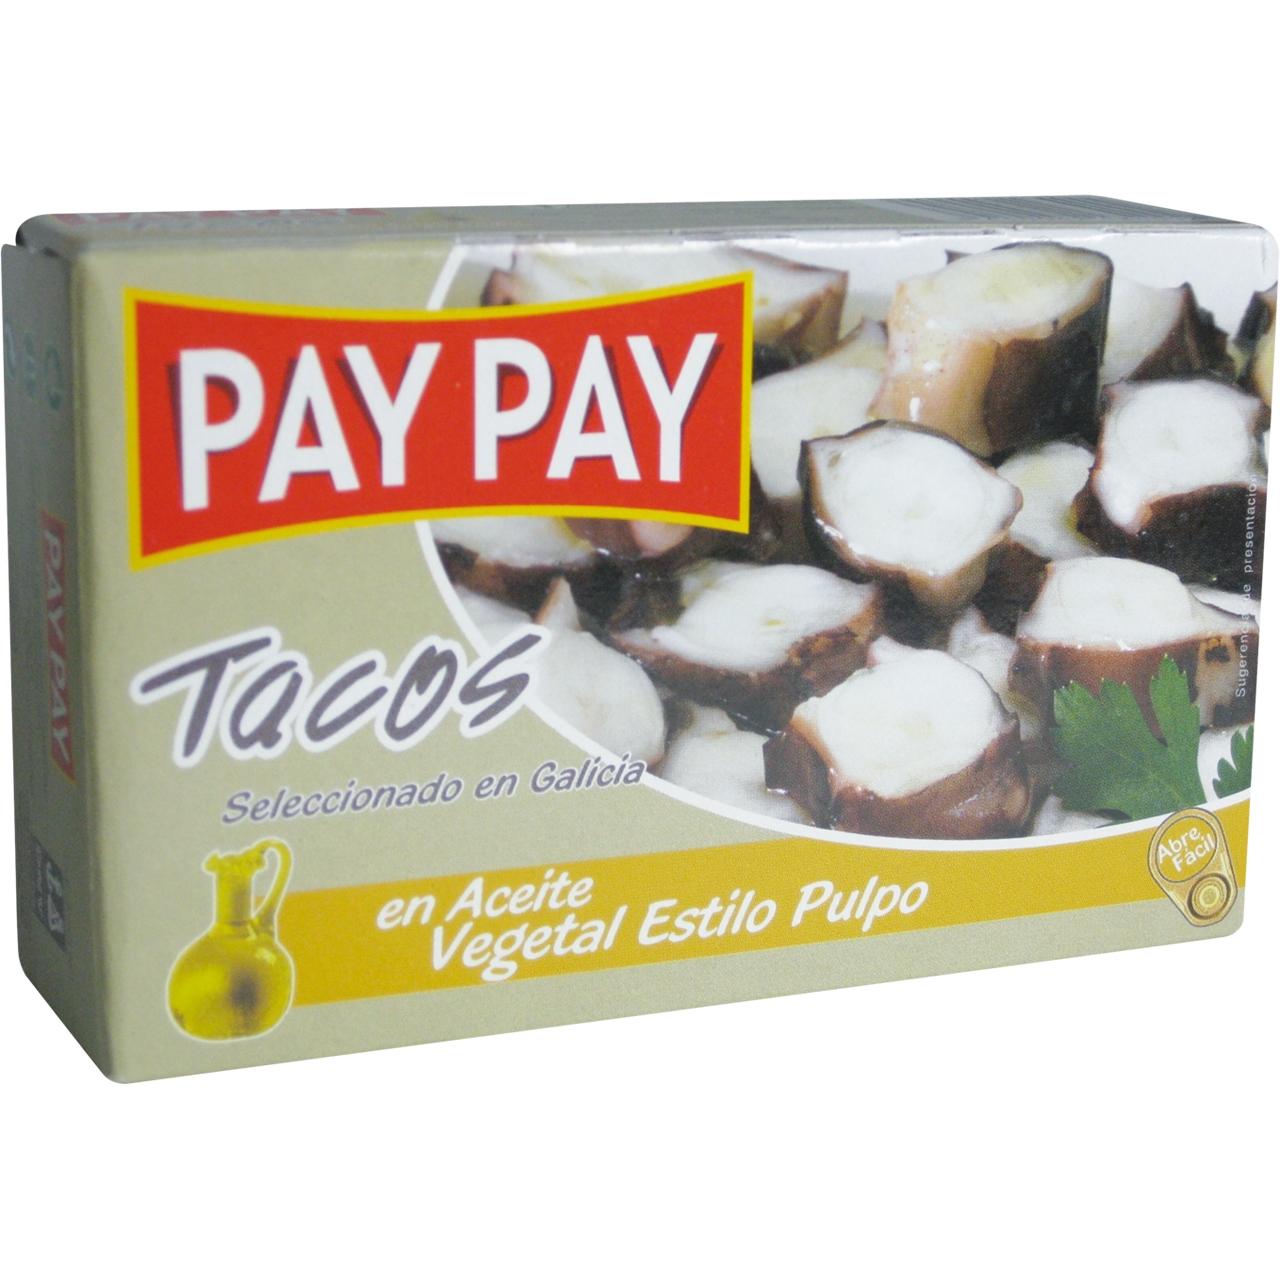 Pop a daus en oli vegetal OL 120 F.O. Pay Pay